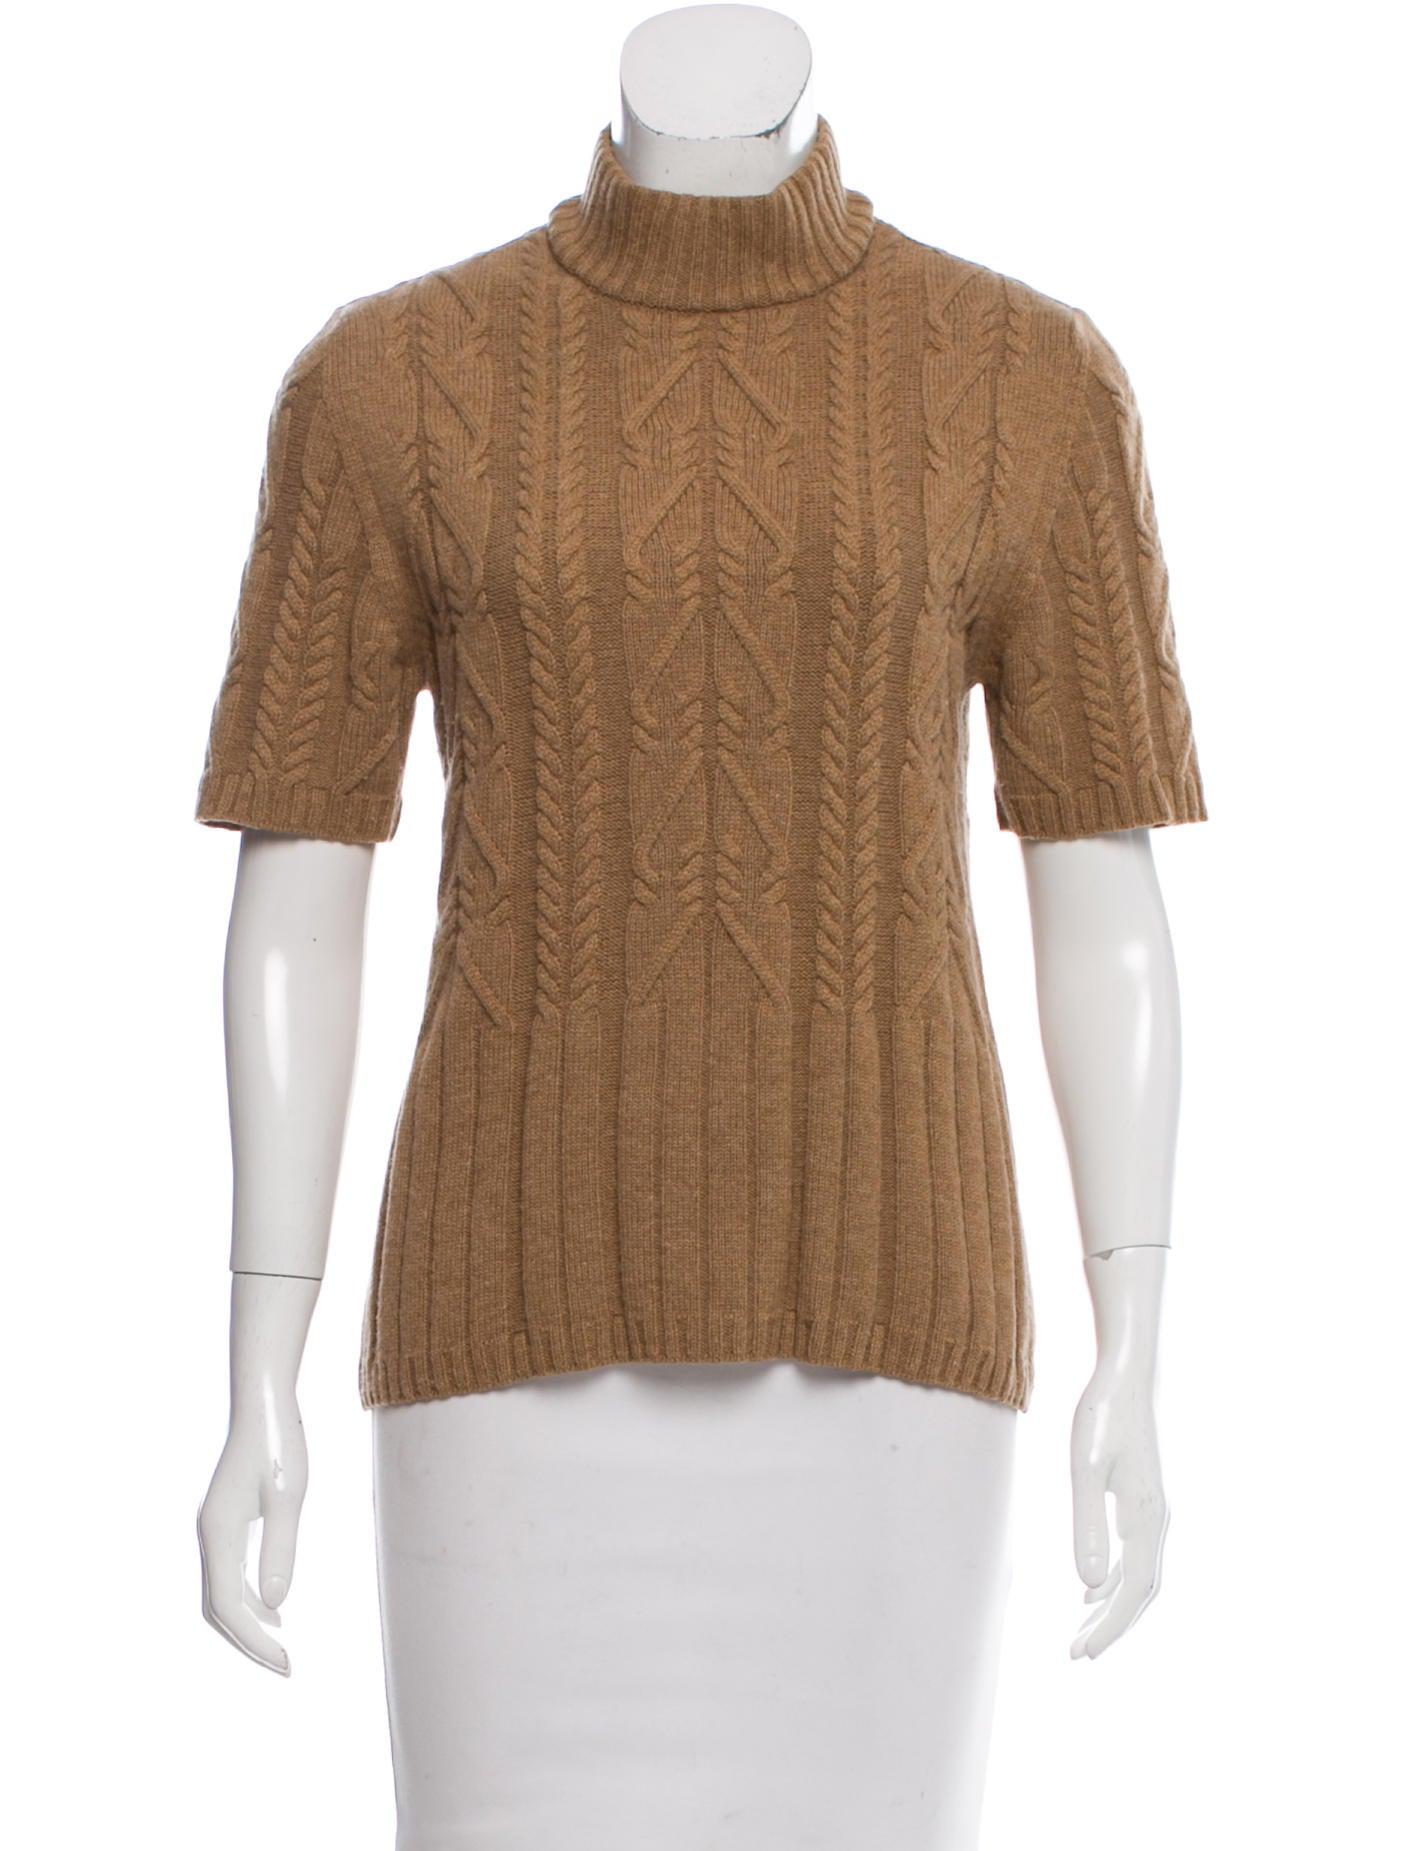 Escada wool cashmere blend top clothing esc22510 for Best wool shirt jackets